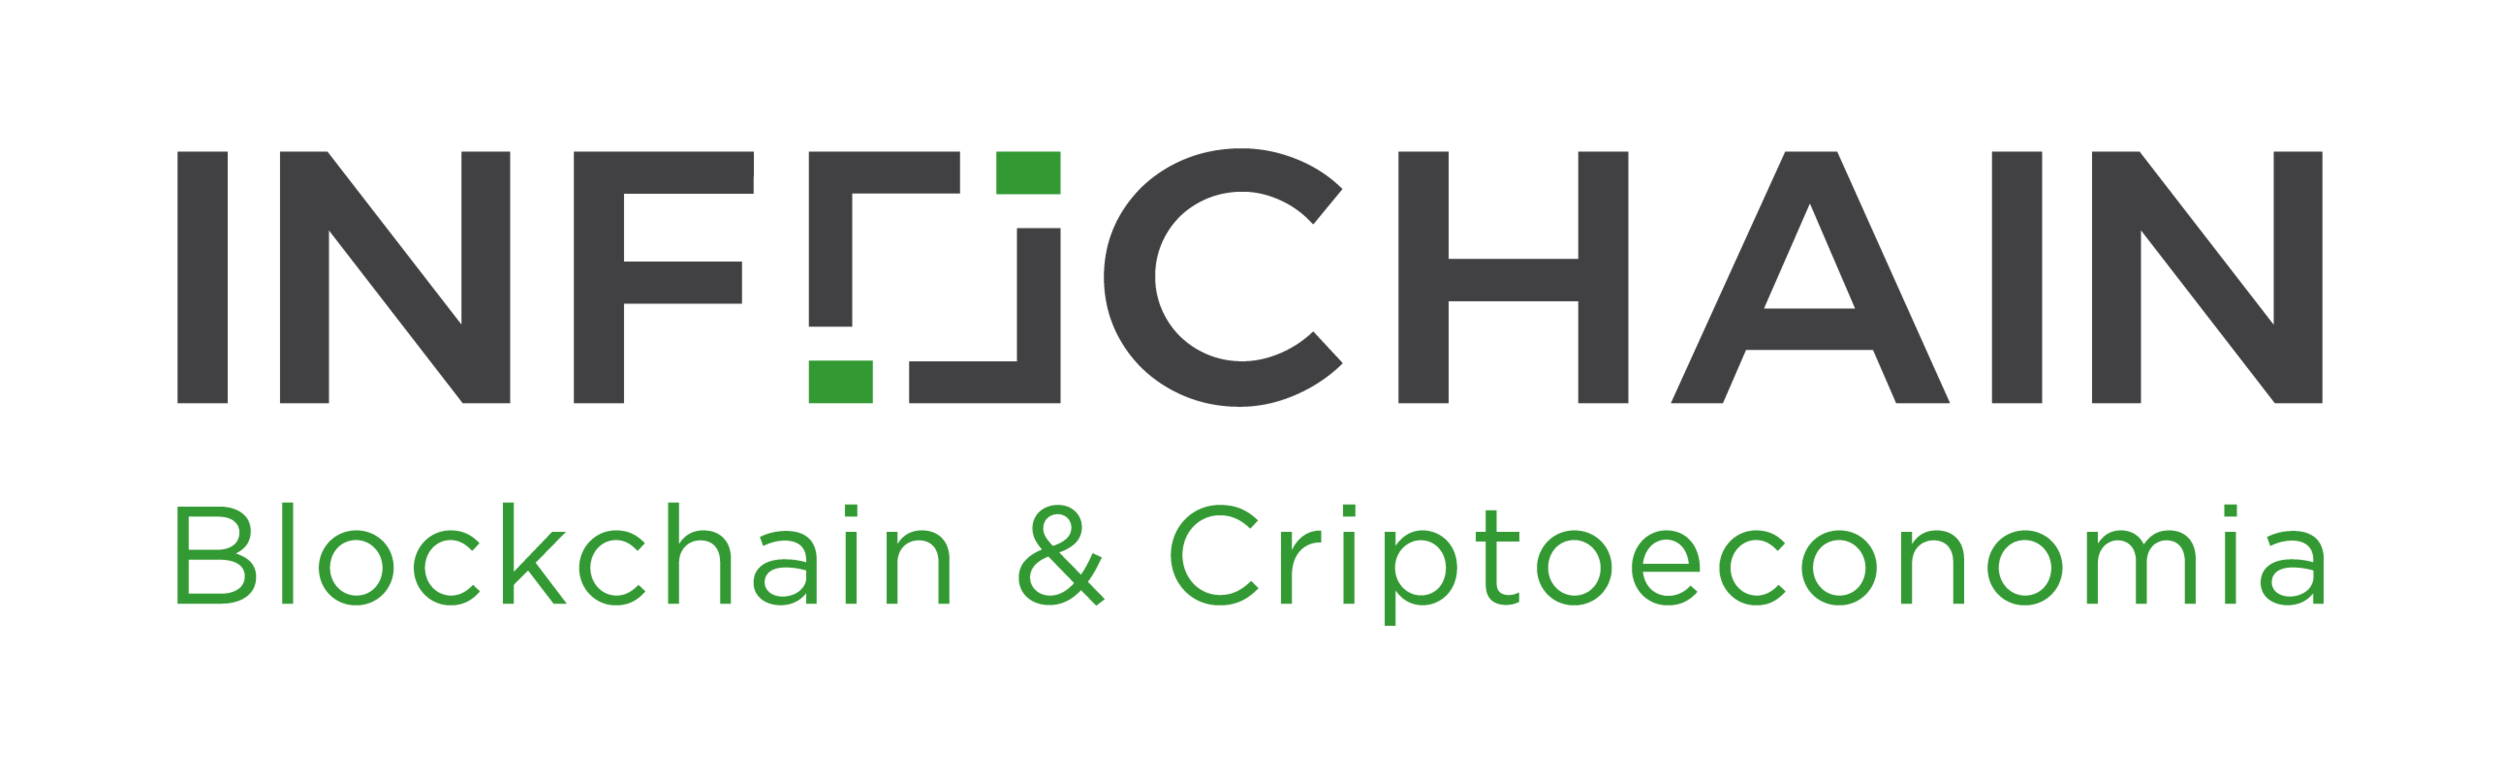 Logo_Infochain_pt_RGB_1.png